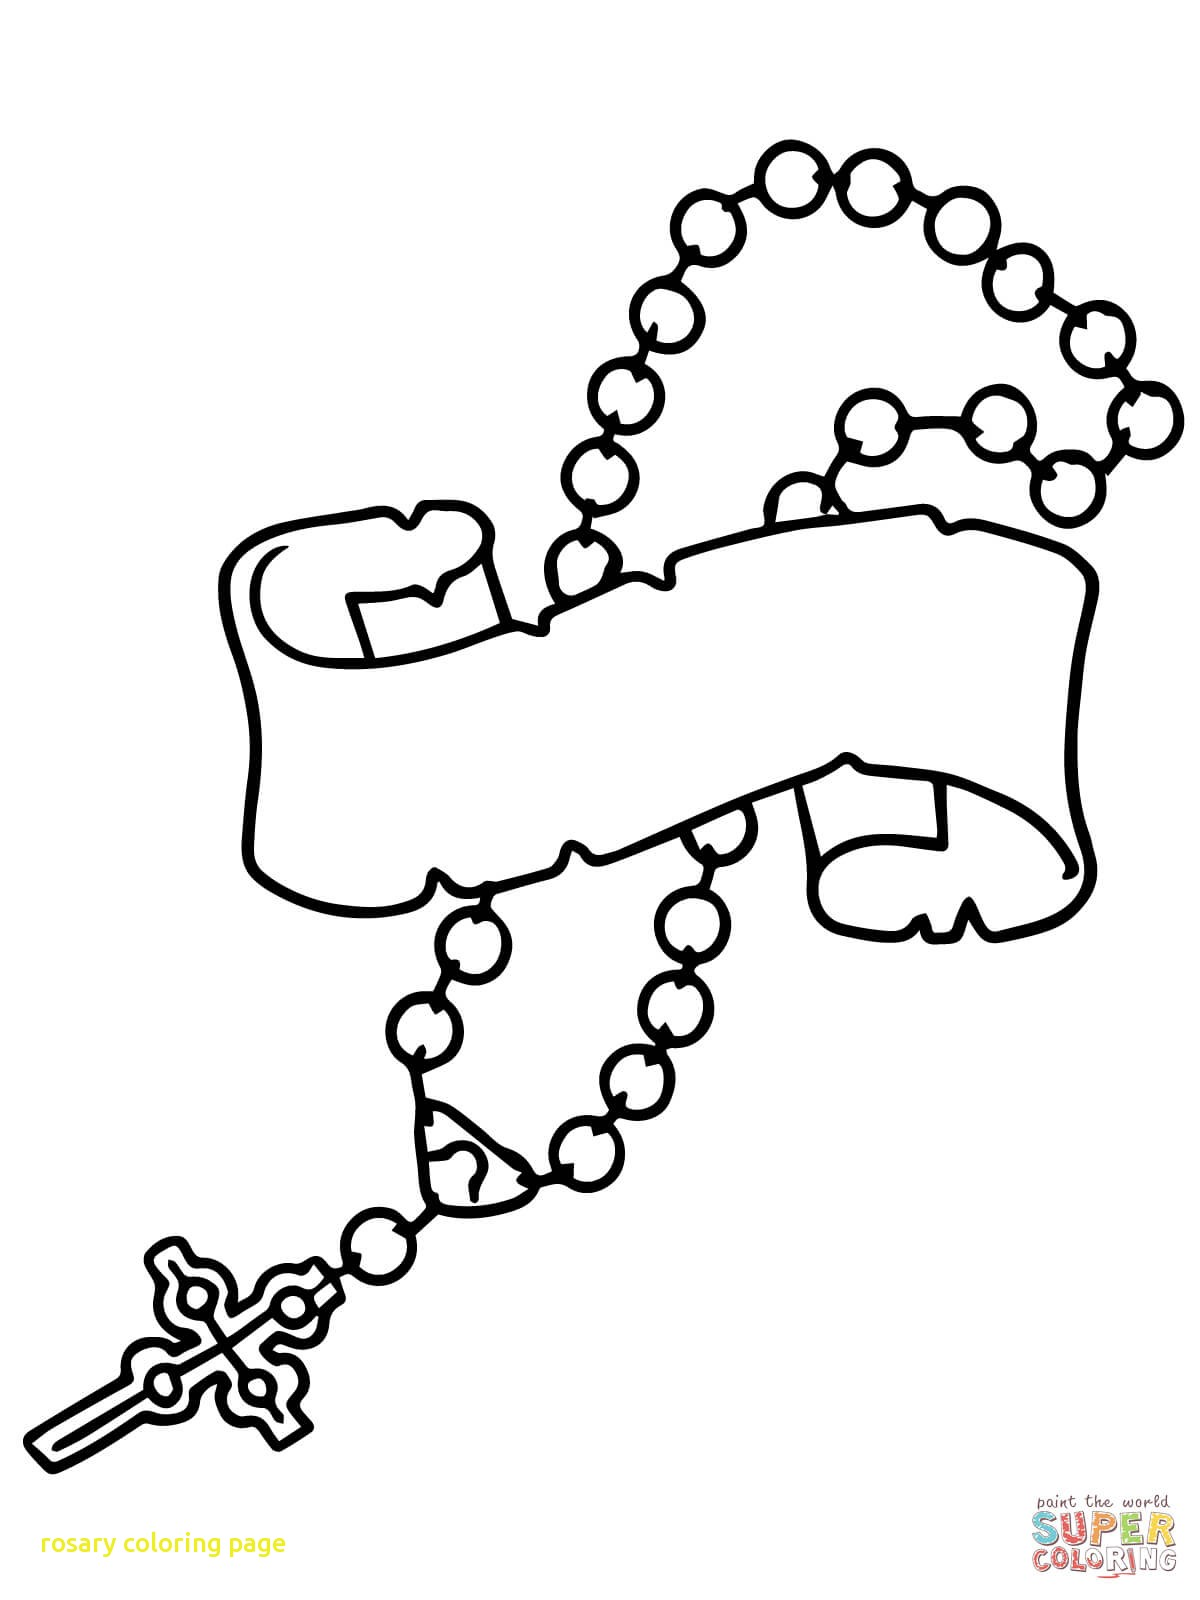 Rosaries Drawing at GetDrawings.com | Free for personal use Rosaries ...